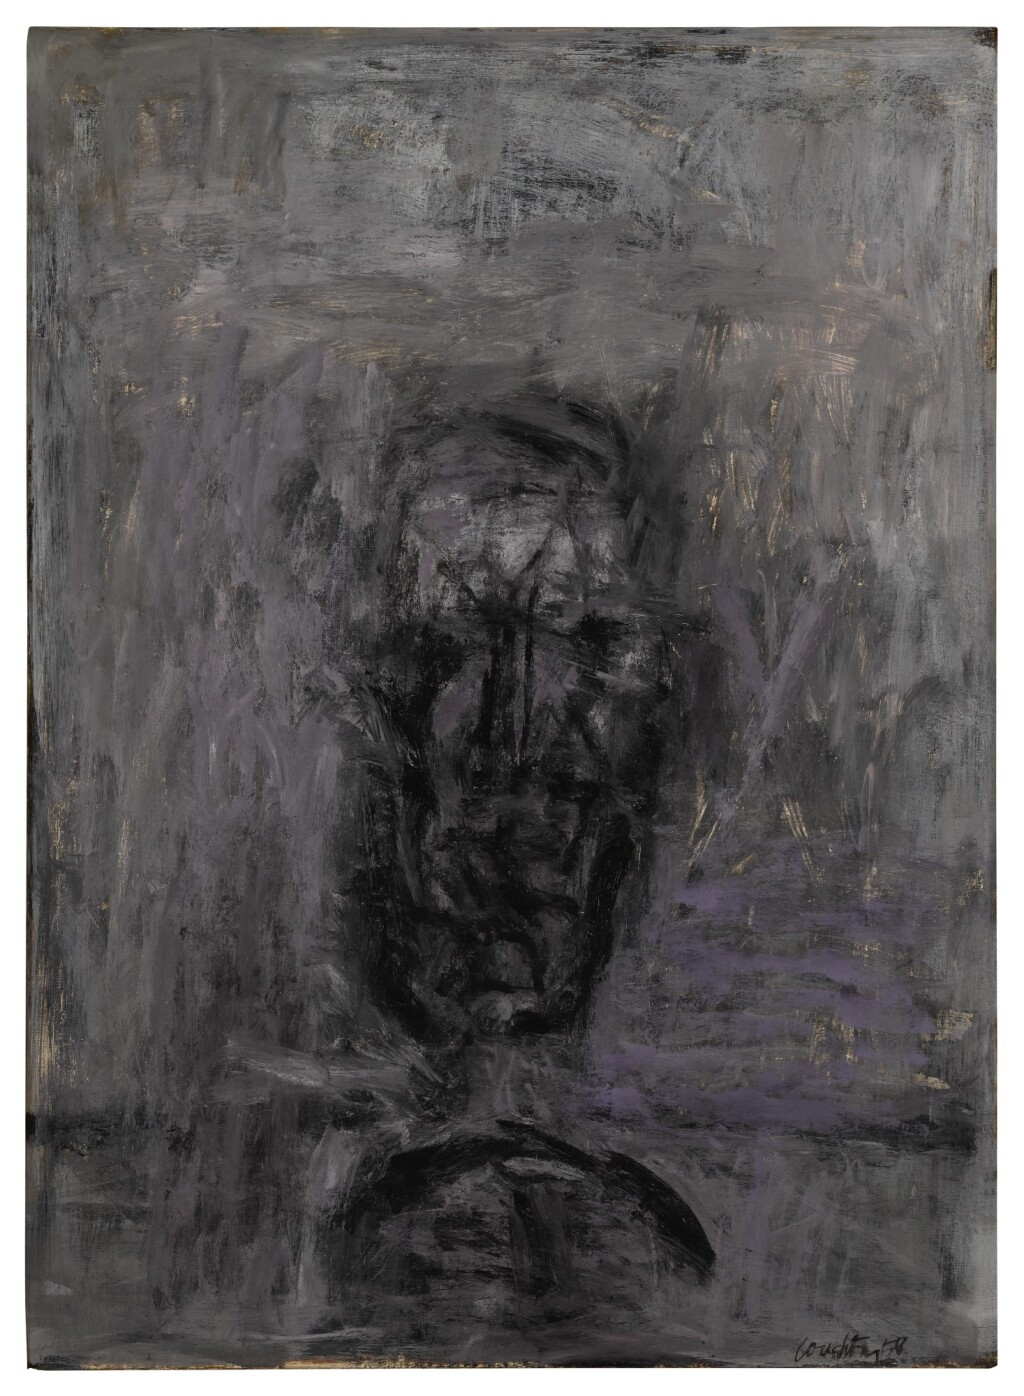 JOHN GRAHAM COUGHTRY | PORTRAIT I